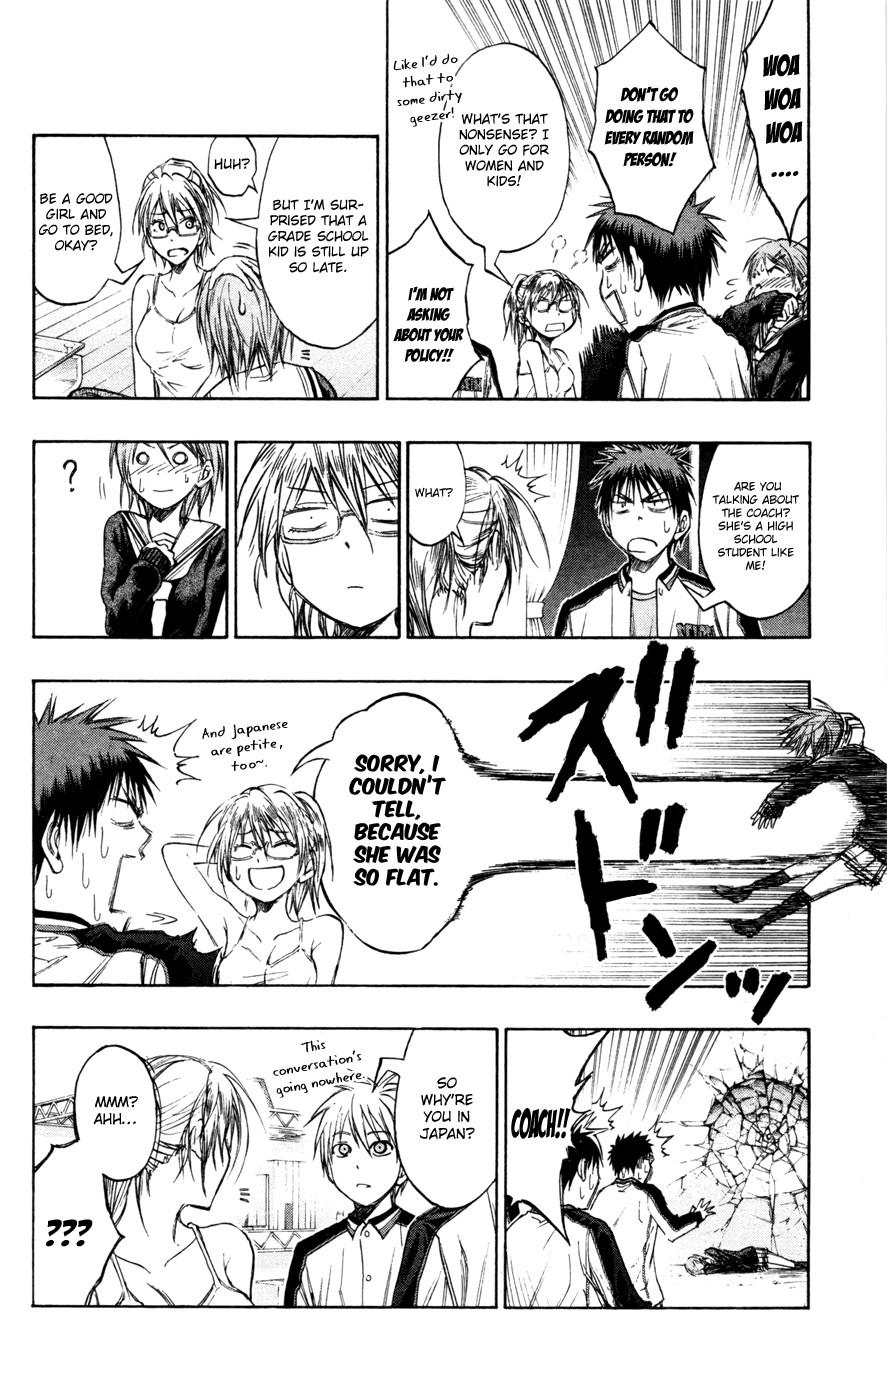 Kuroko no Basket Manga Chapter 141 - Image 06